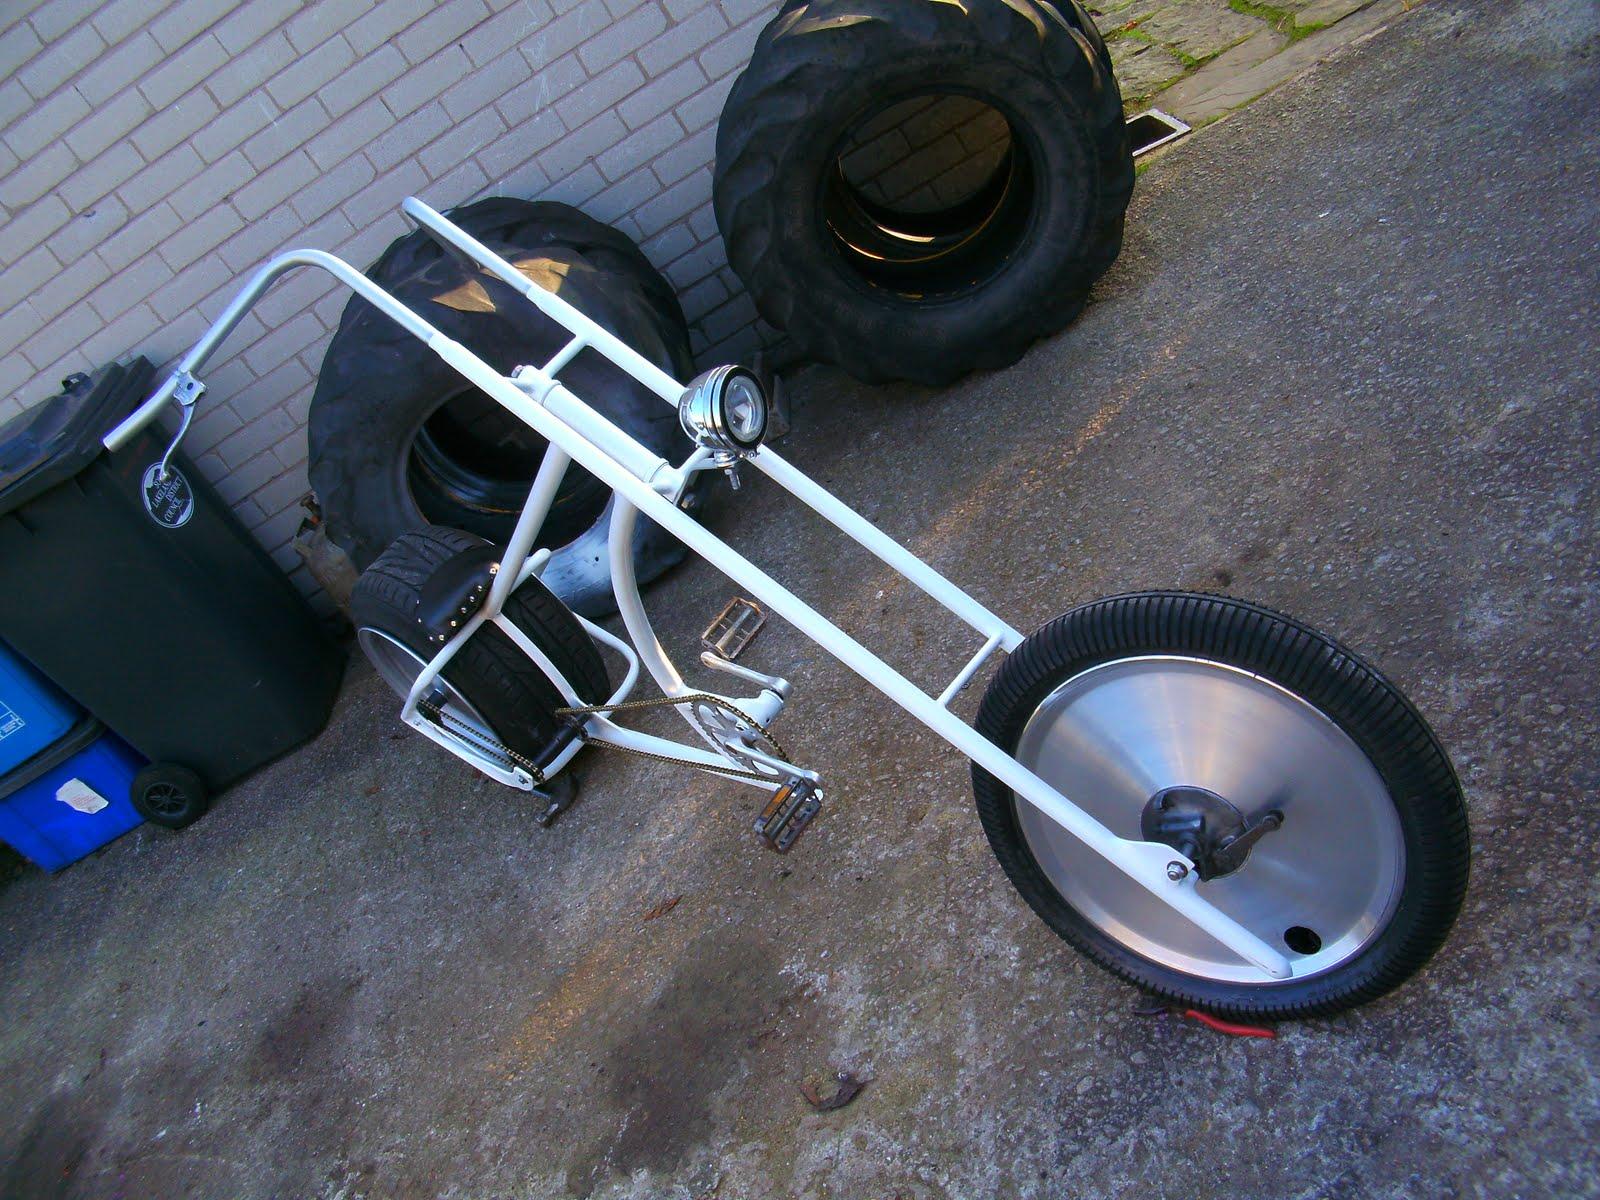 http://2.bp.blogspot.com/__MM5EkTPxAQ/TPeK2mhy_5I/AAAAAAAABA8/fYt_Stv743E/s1600/chopper%2Bbike%2B5%2B005.jpg